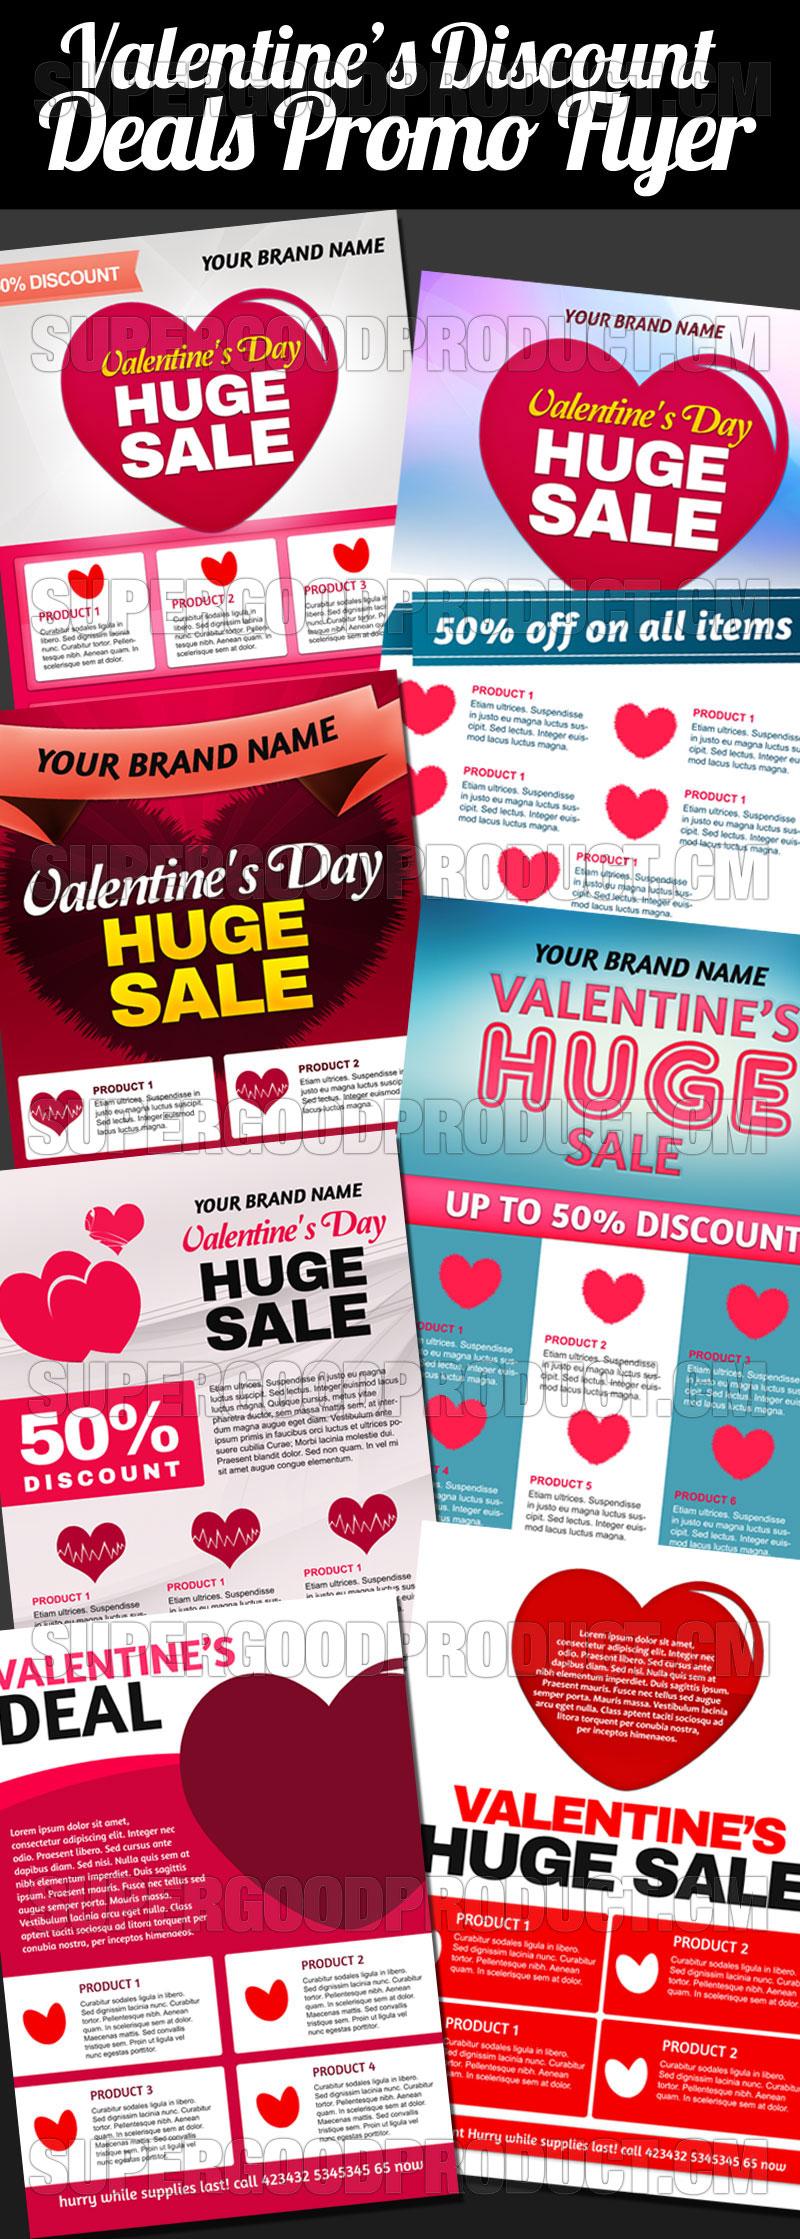 Valentines-Discount-Deals-Promo-Flyer